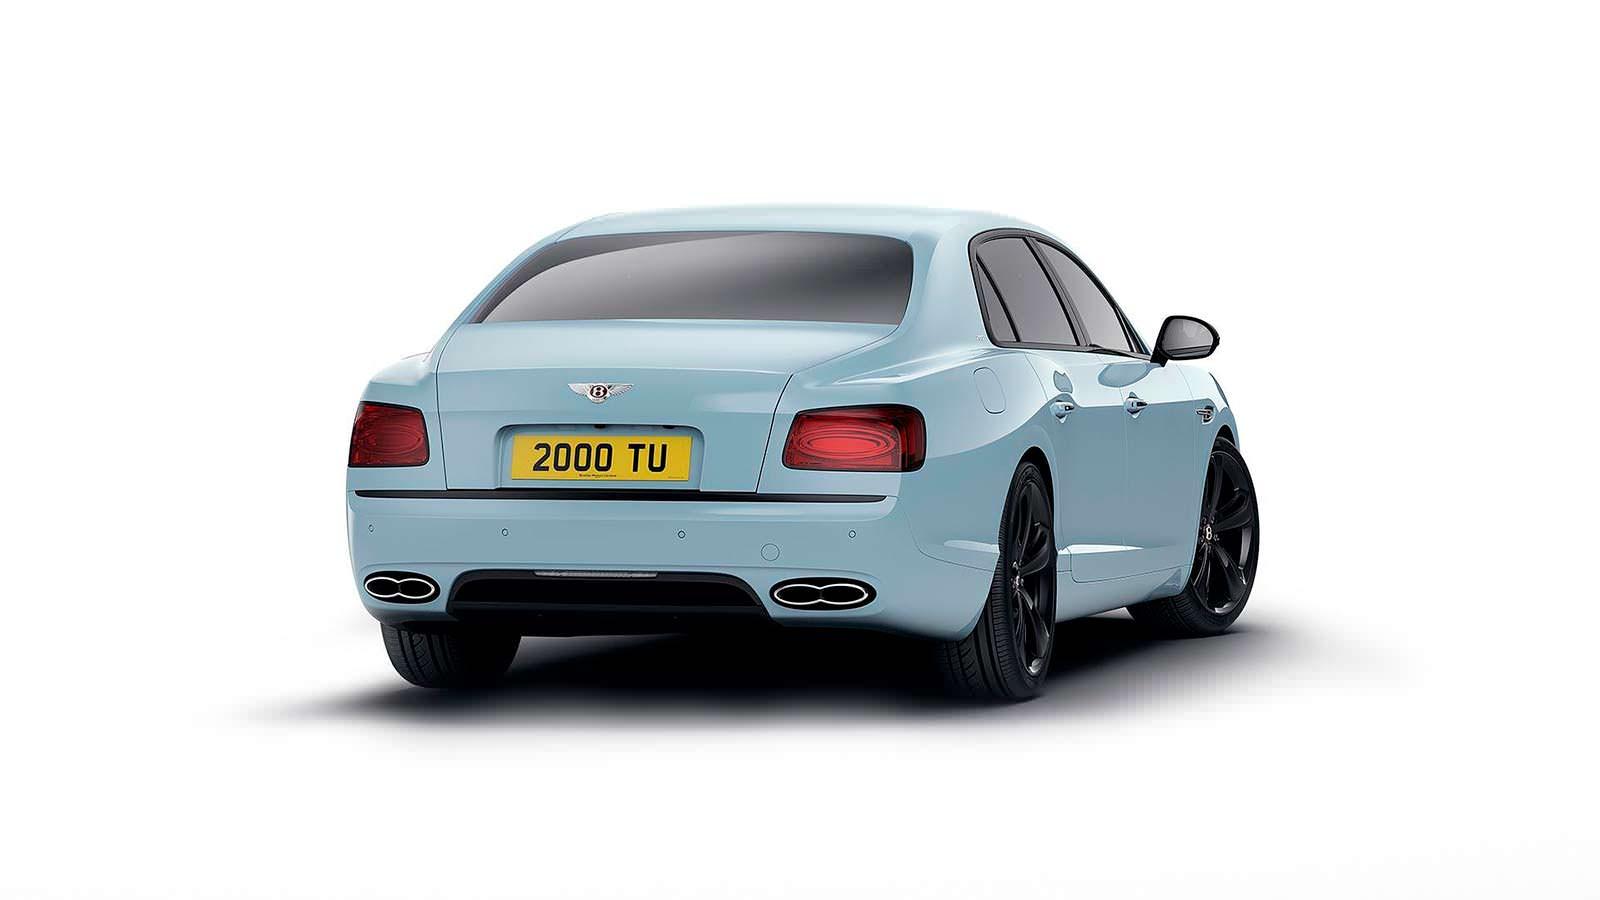 Спецверсия Bentley Flying Spur V8 S Black Edition